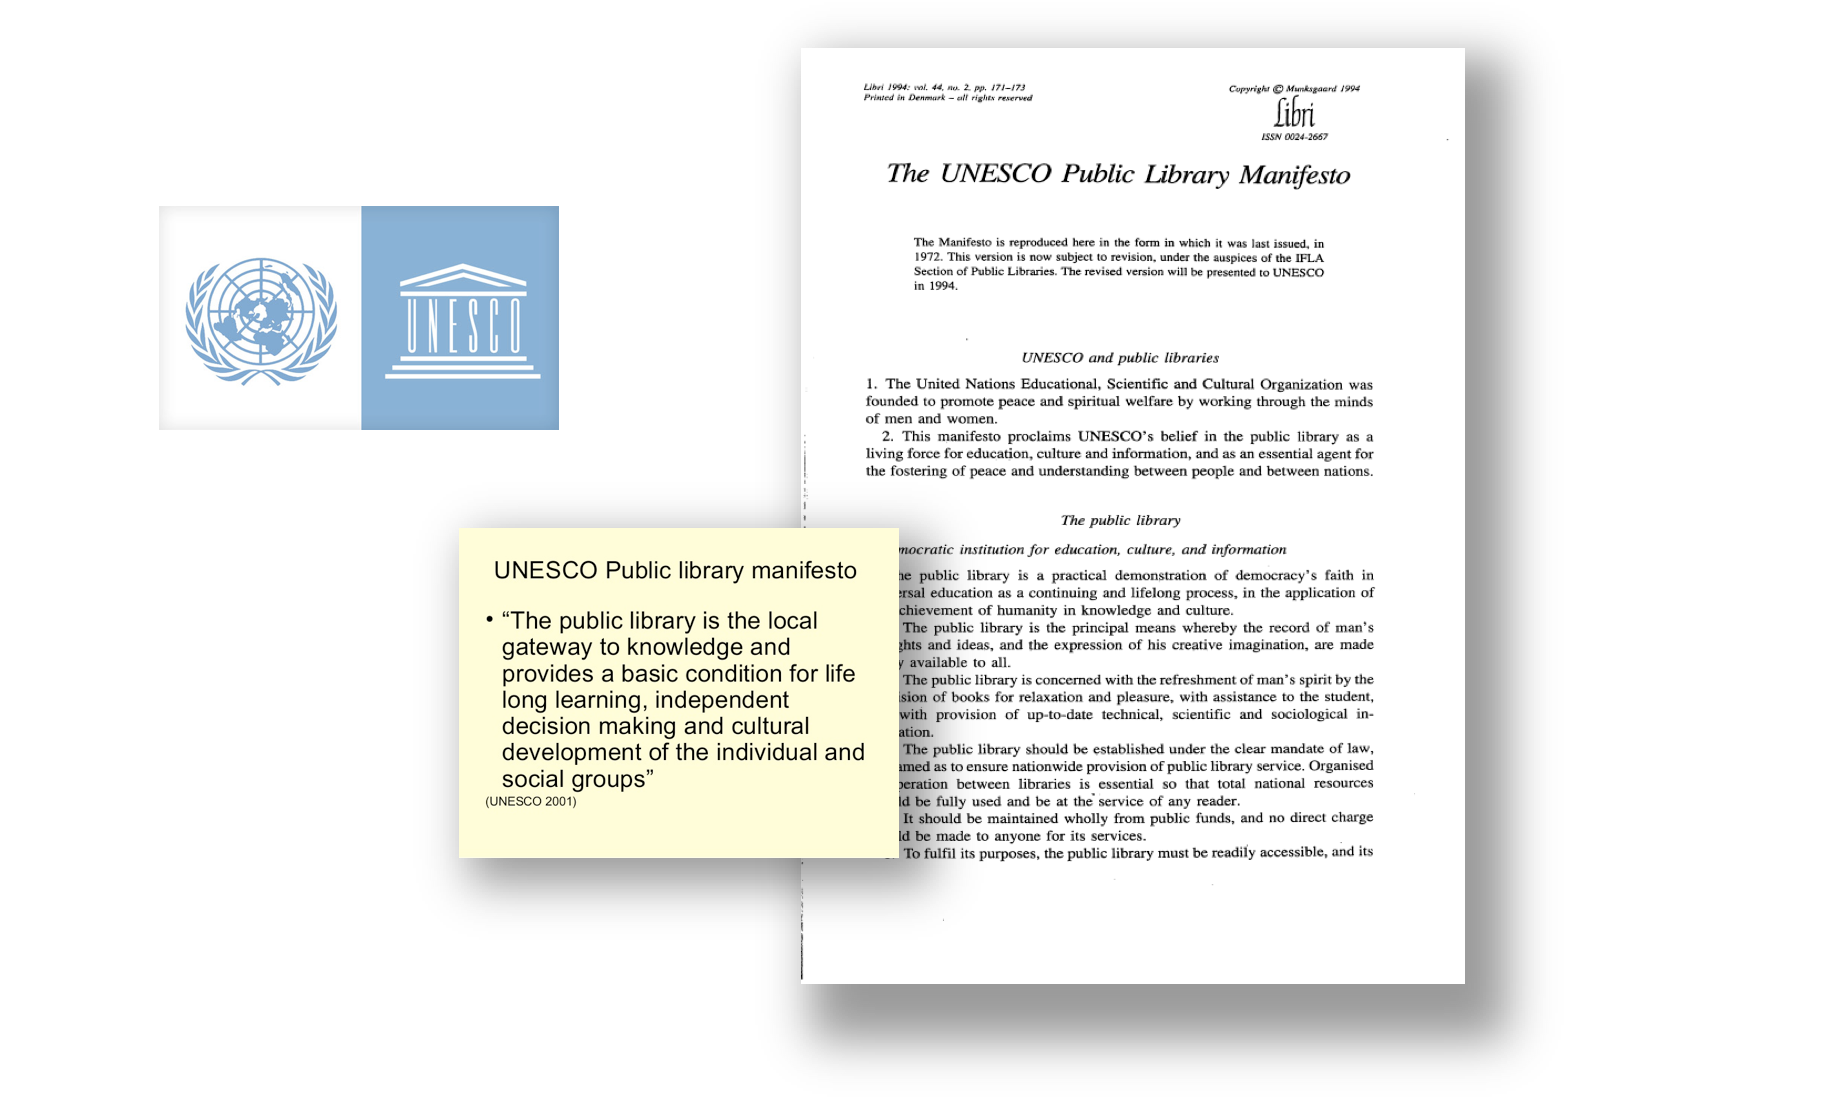 Public Library Manifesto - UNESCO